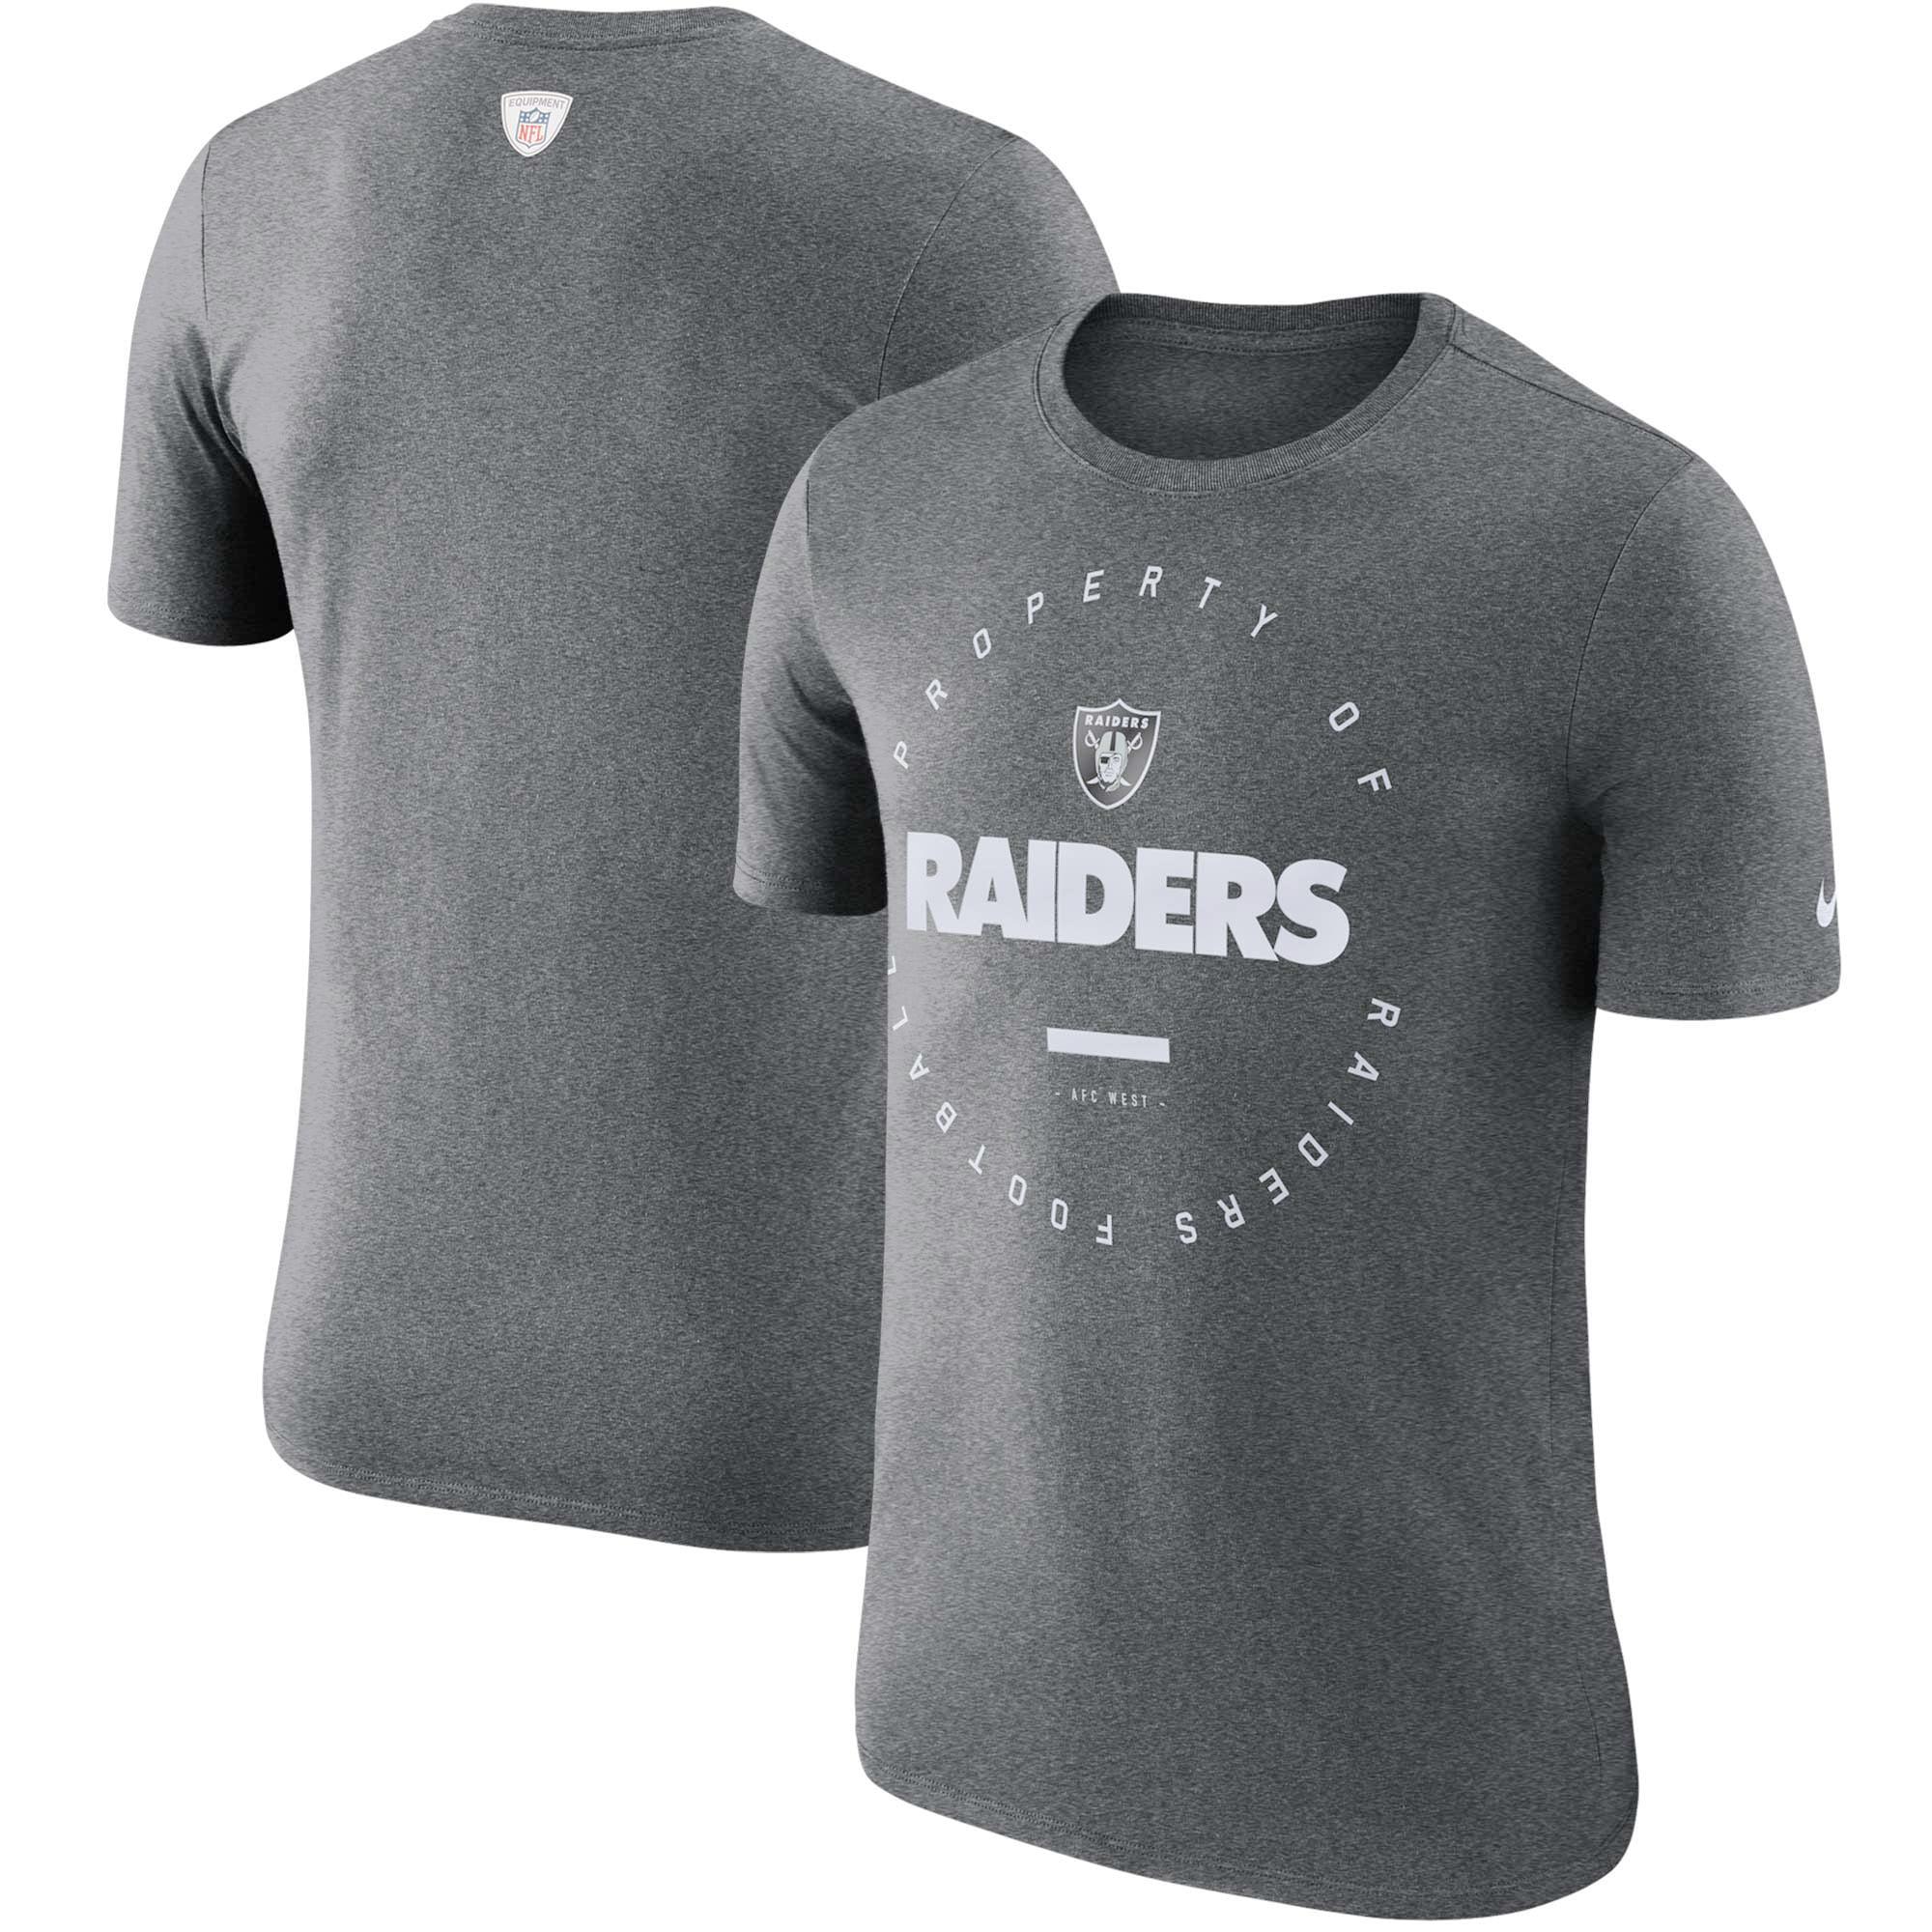 Oakland Raiders Nike Sideline Property Of Performance T-Shirt - Charcoal